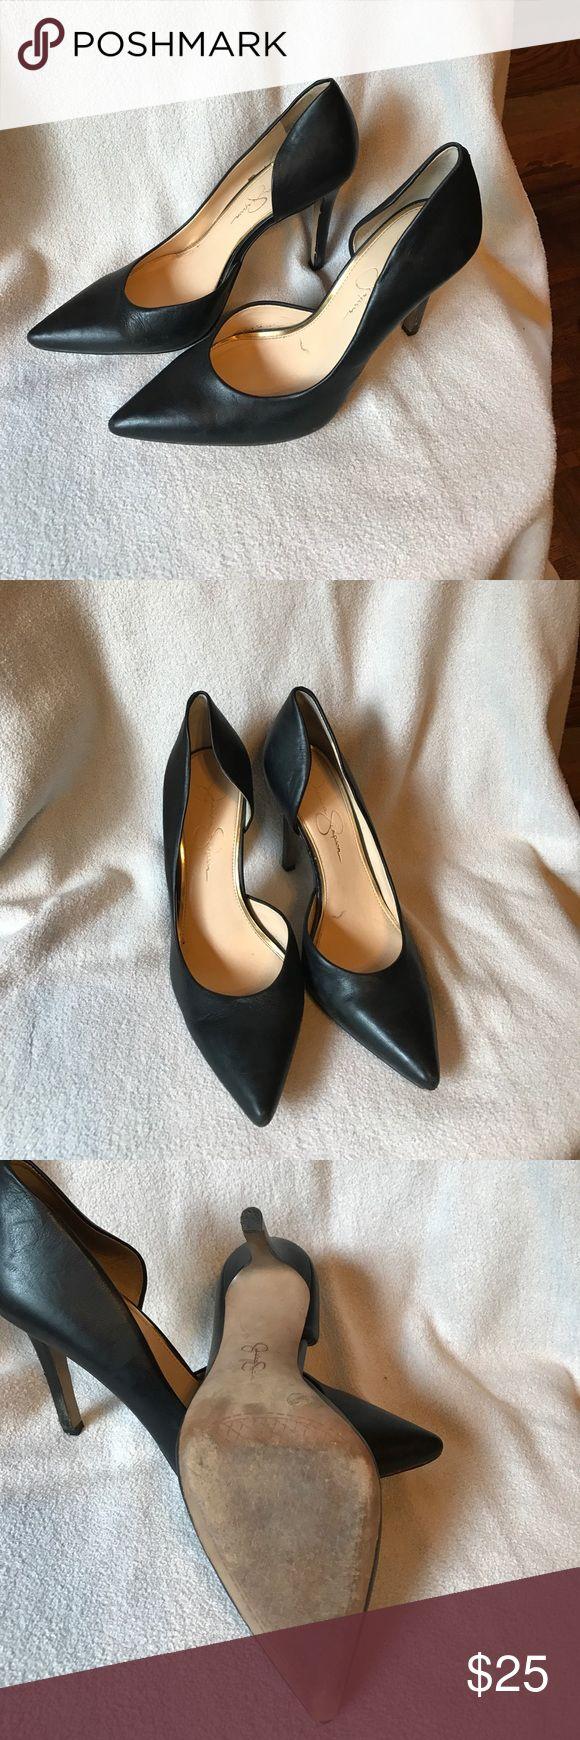 Black pumps Black leather pumps, 4 1/2 inch heel Jessica Simpson Shoes Heels